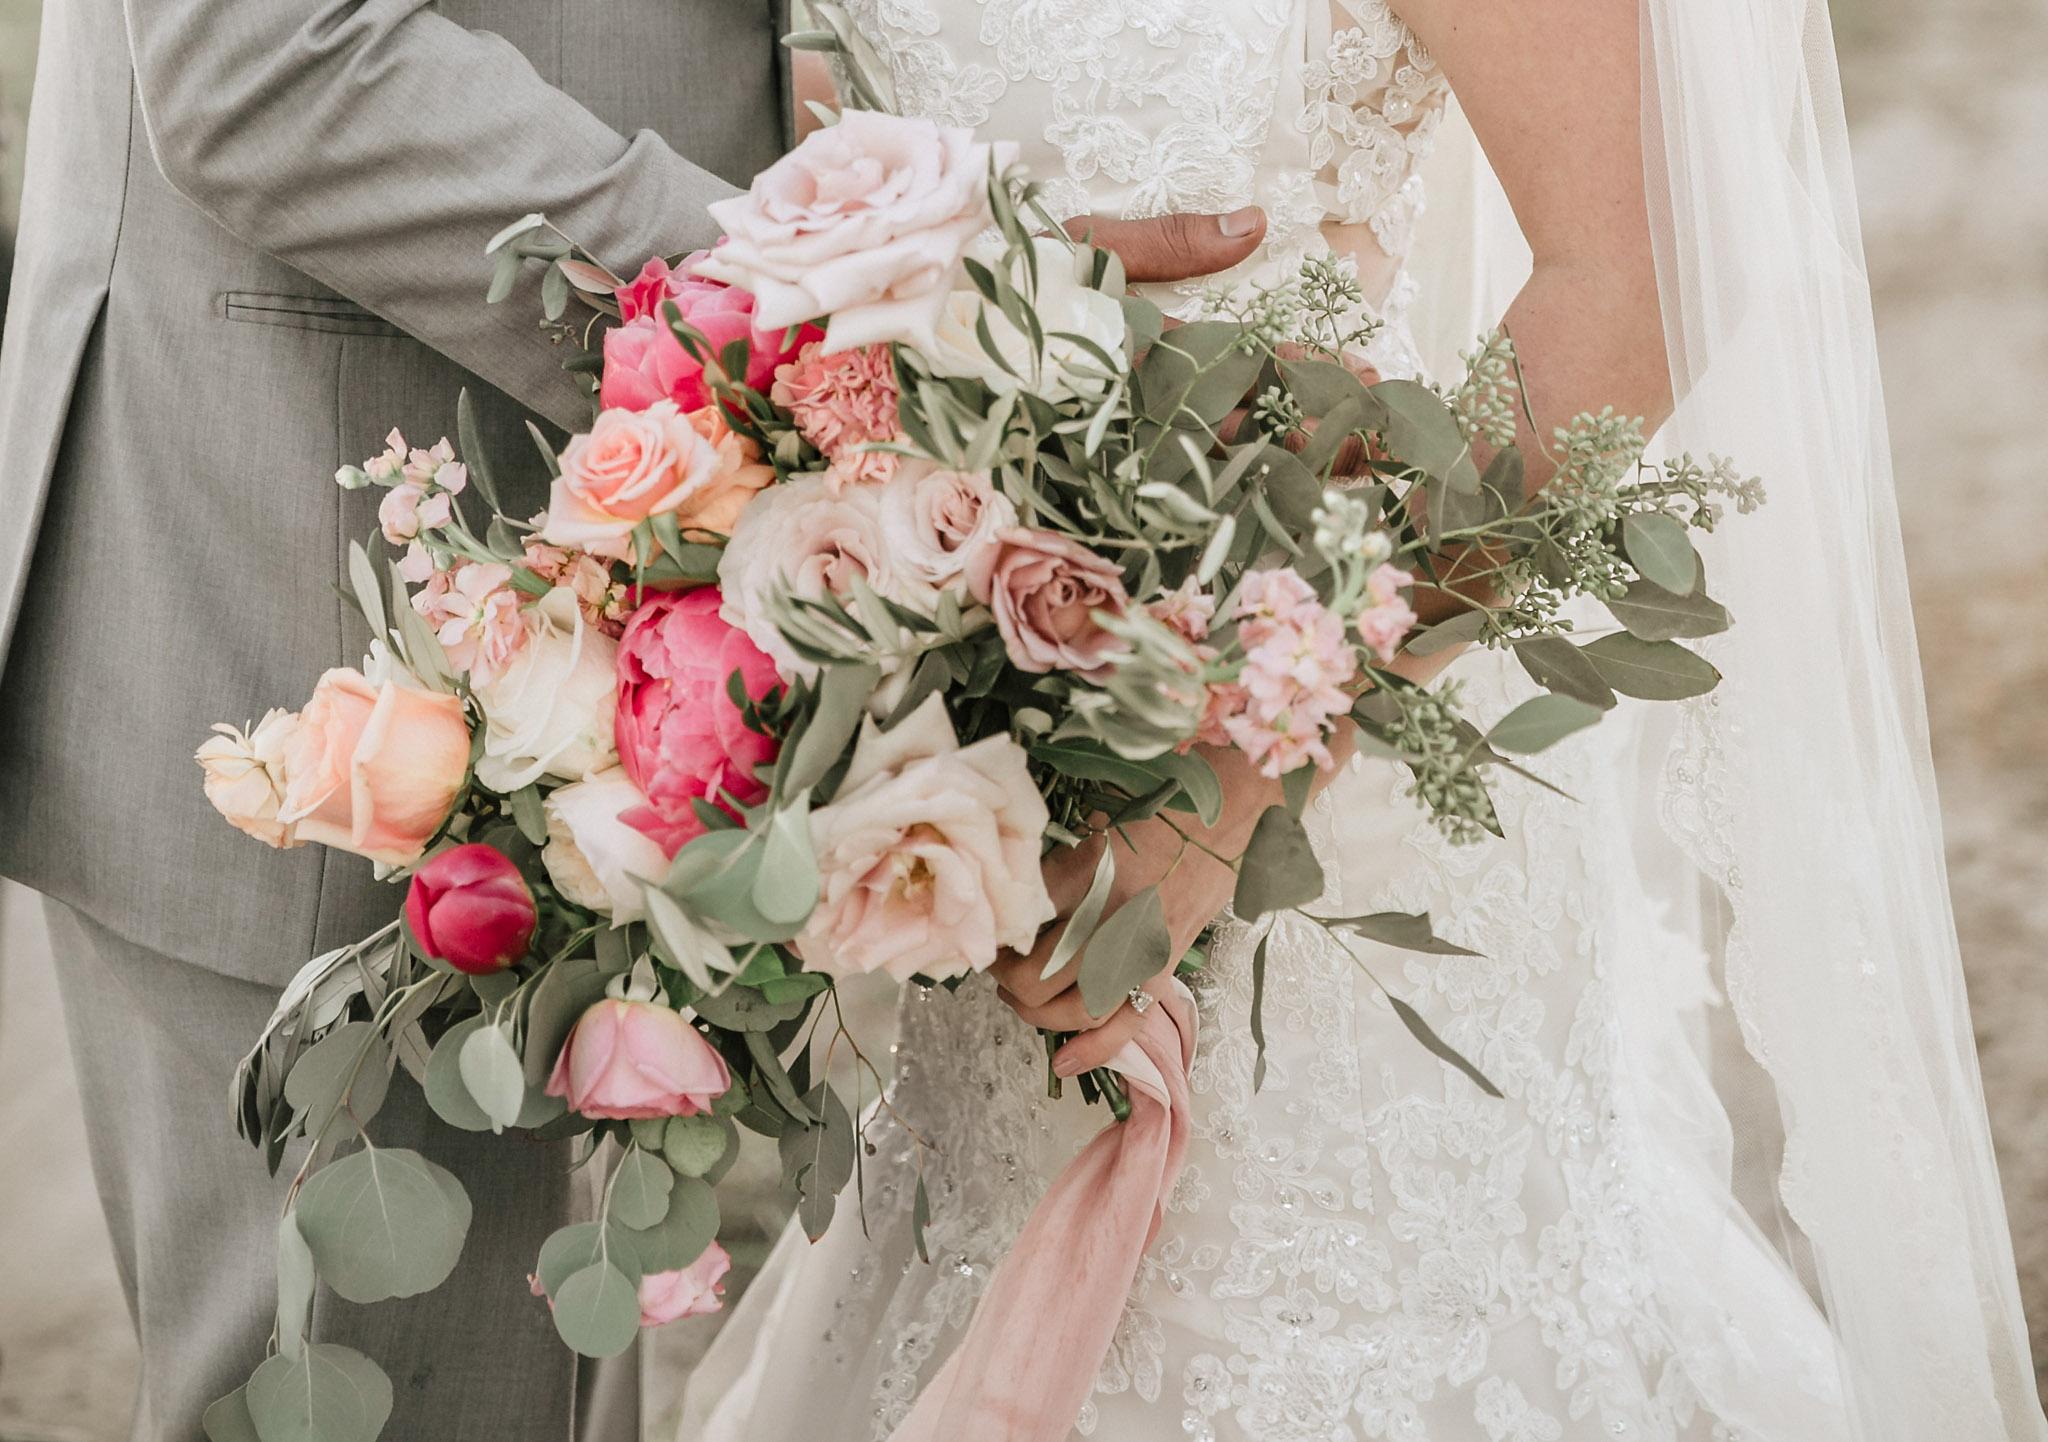 Peach and Mauve Wedding Bouquet